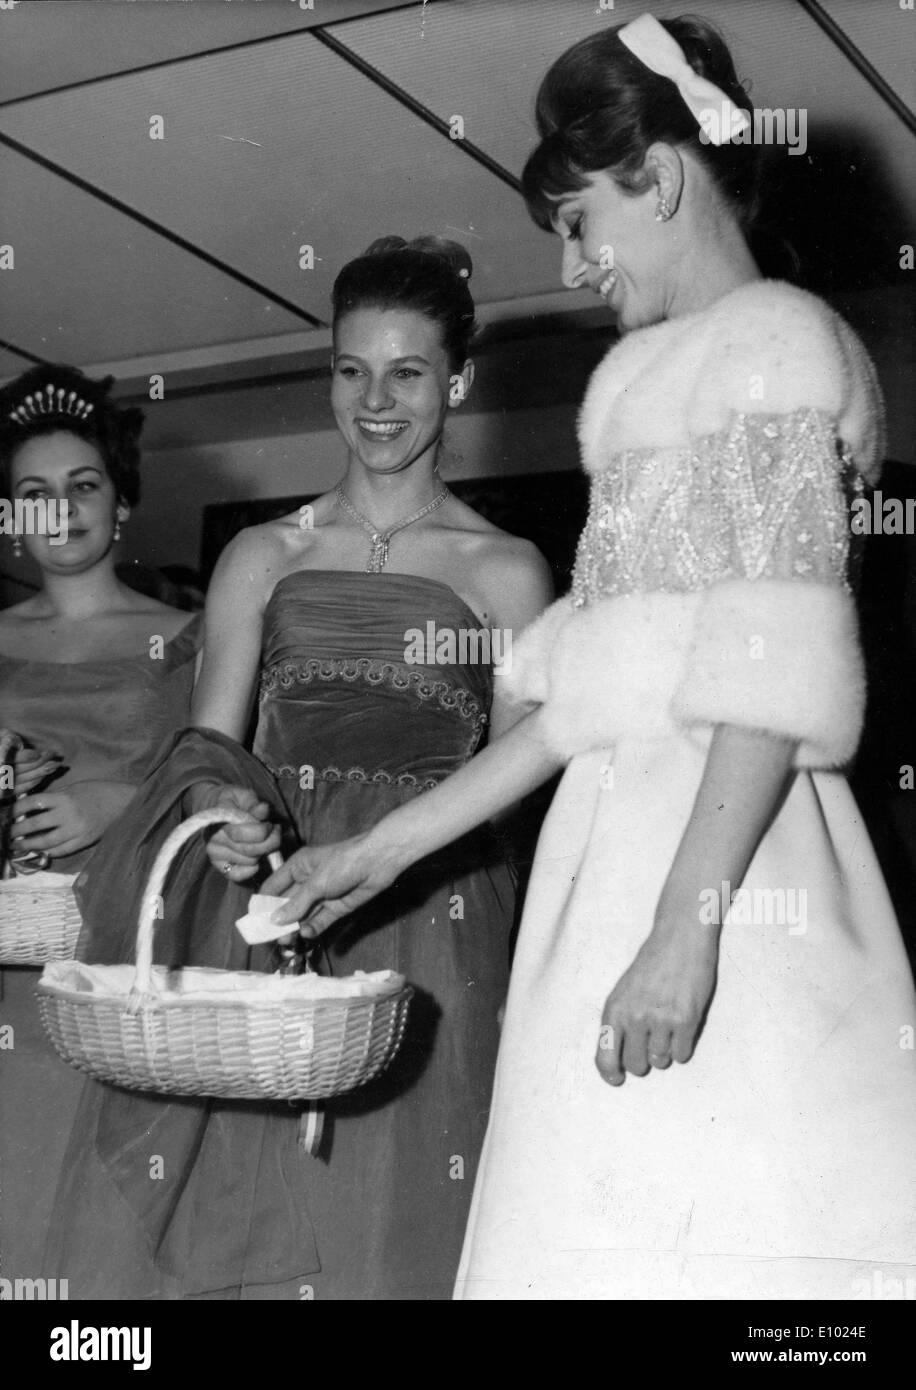 Actress Audrey Hepburn aboard S.S. France - Stock Image